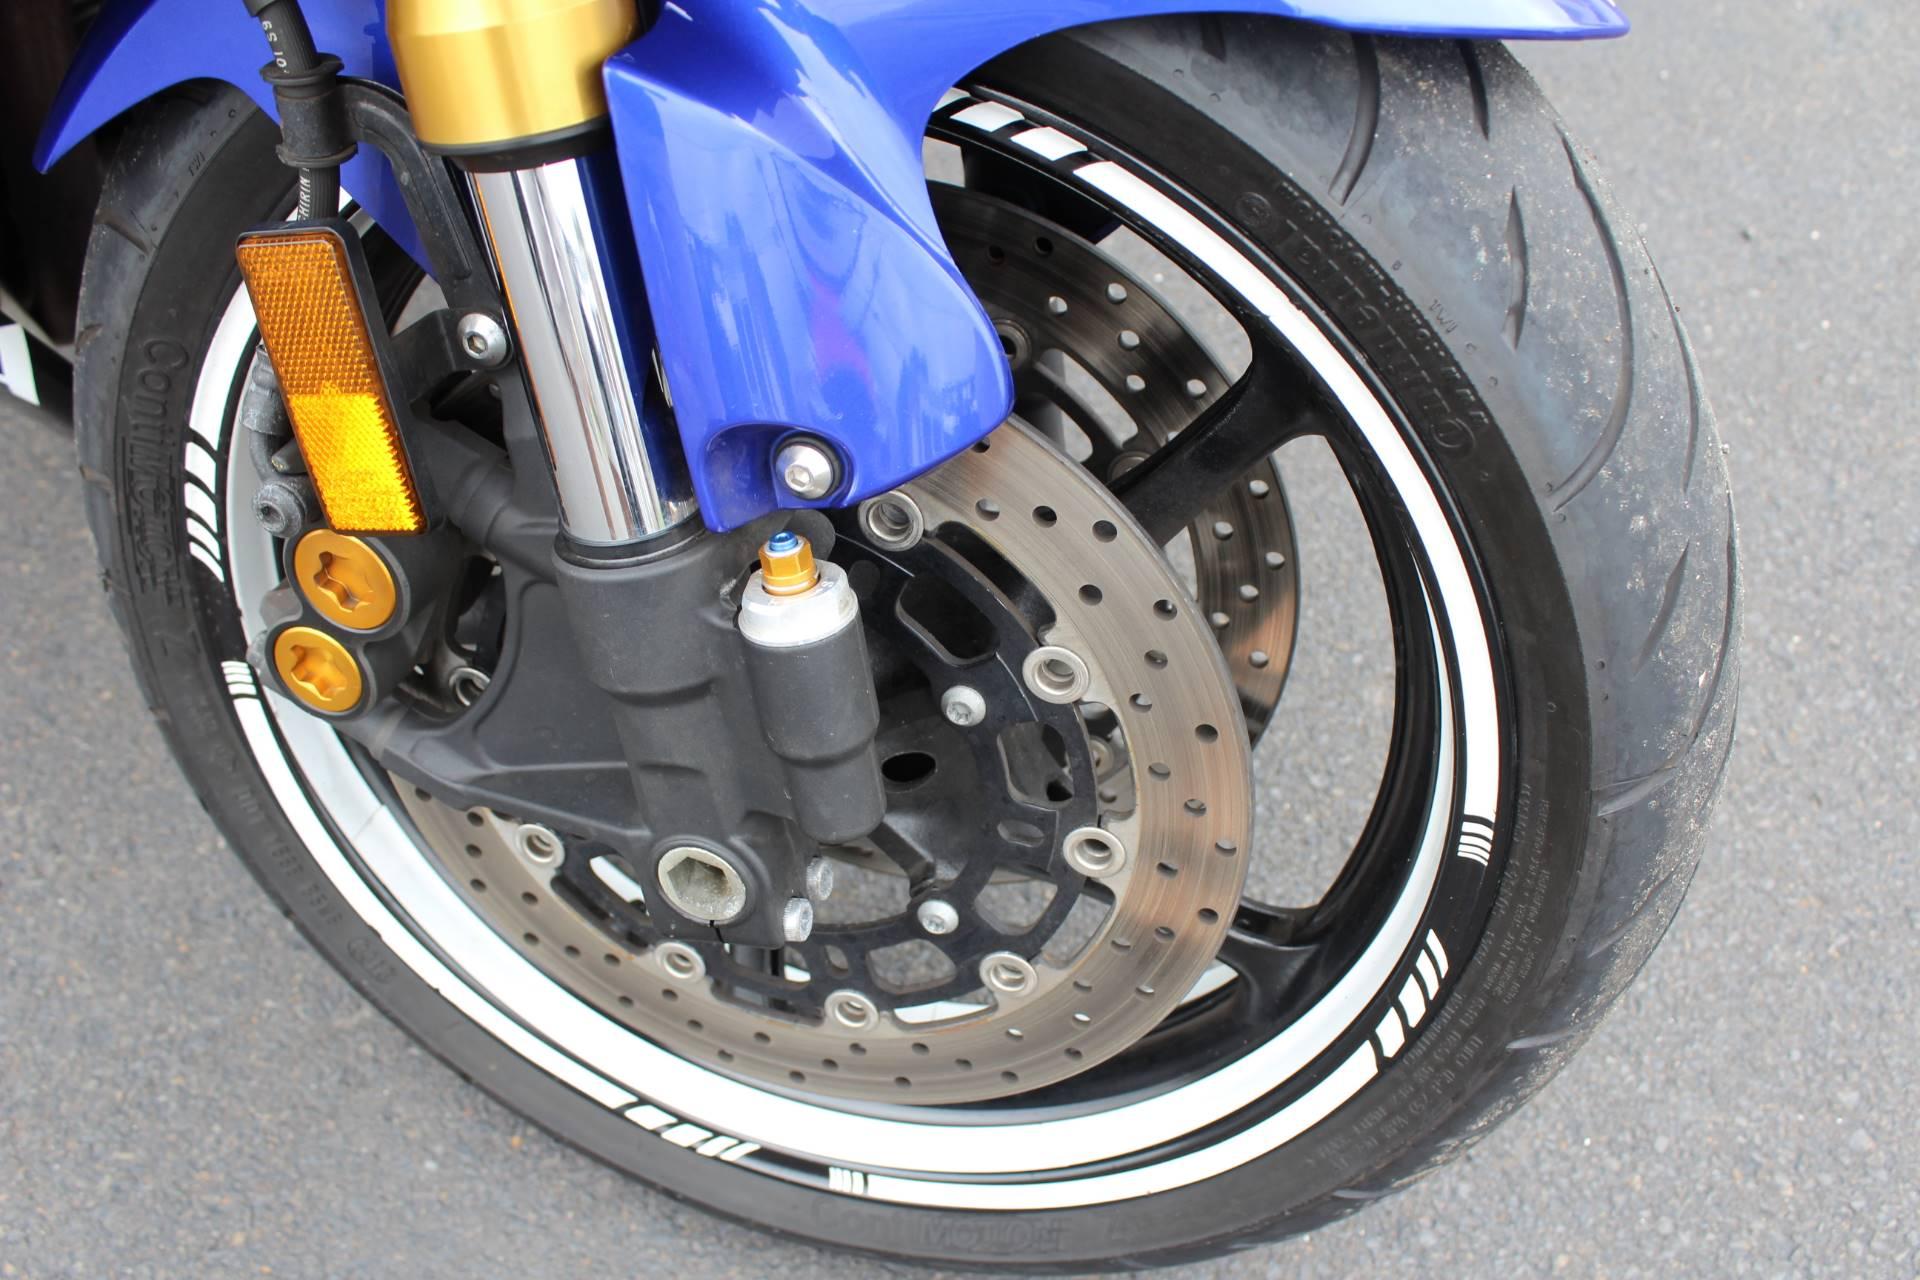 2009 Yamaha YZFR6 4